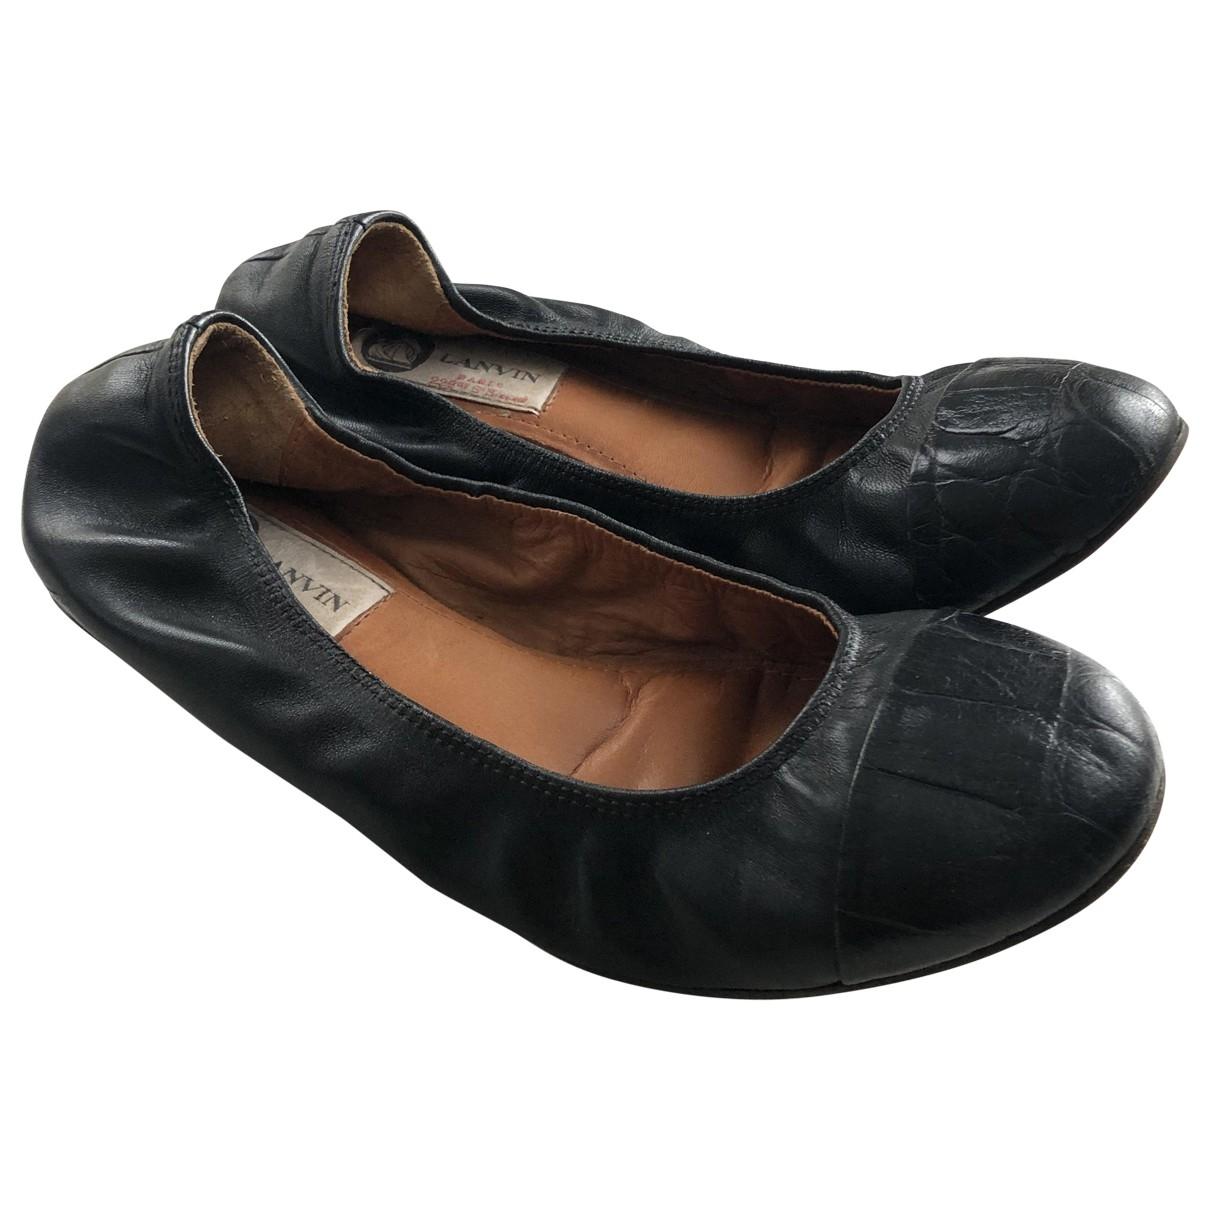 Lanvin \N Black Leather Ballet flats for Women 35 EU